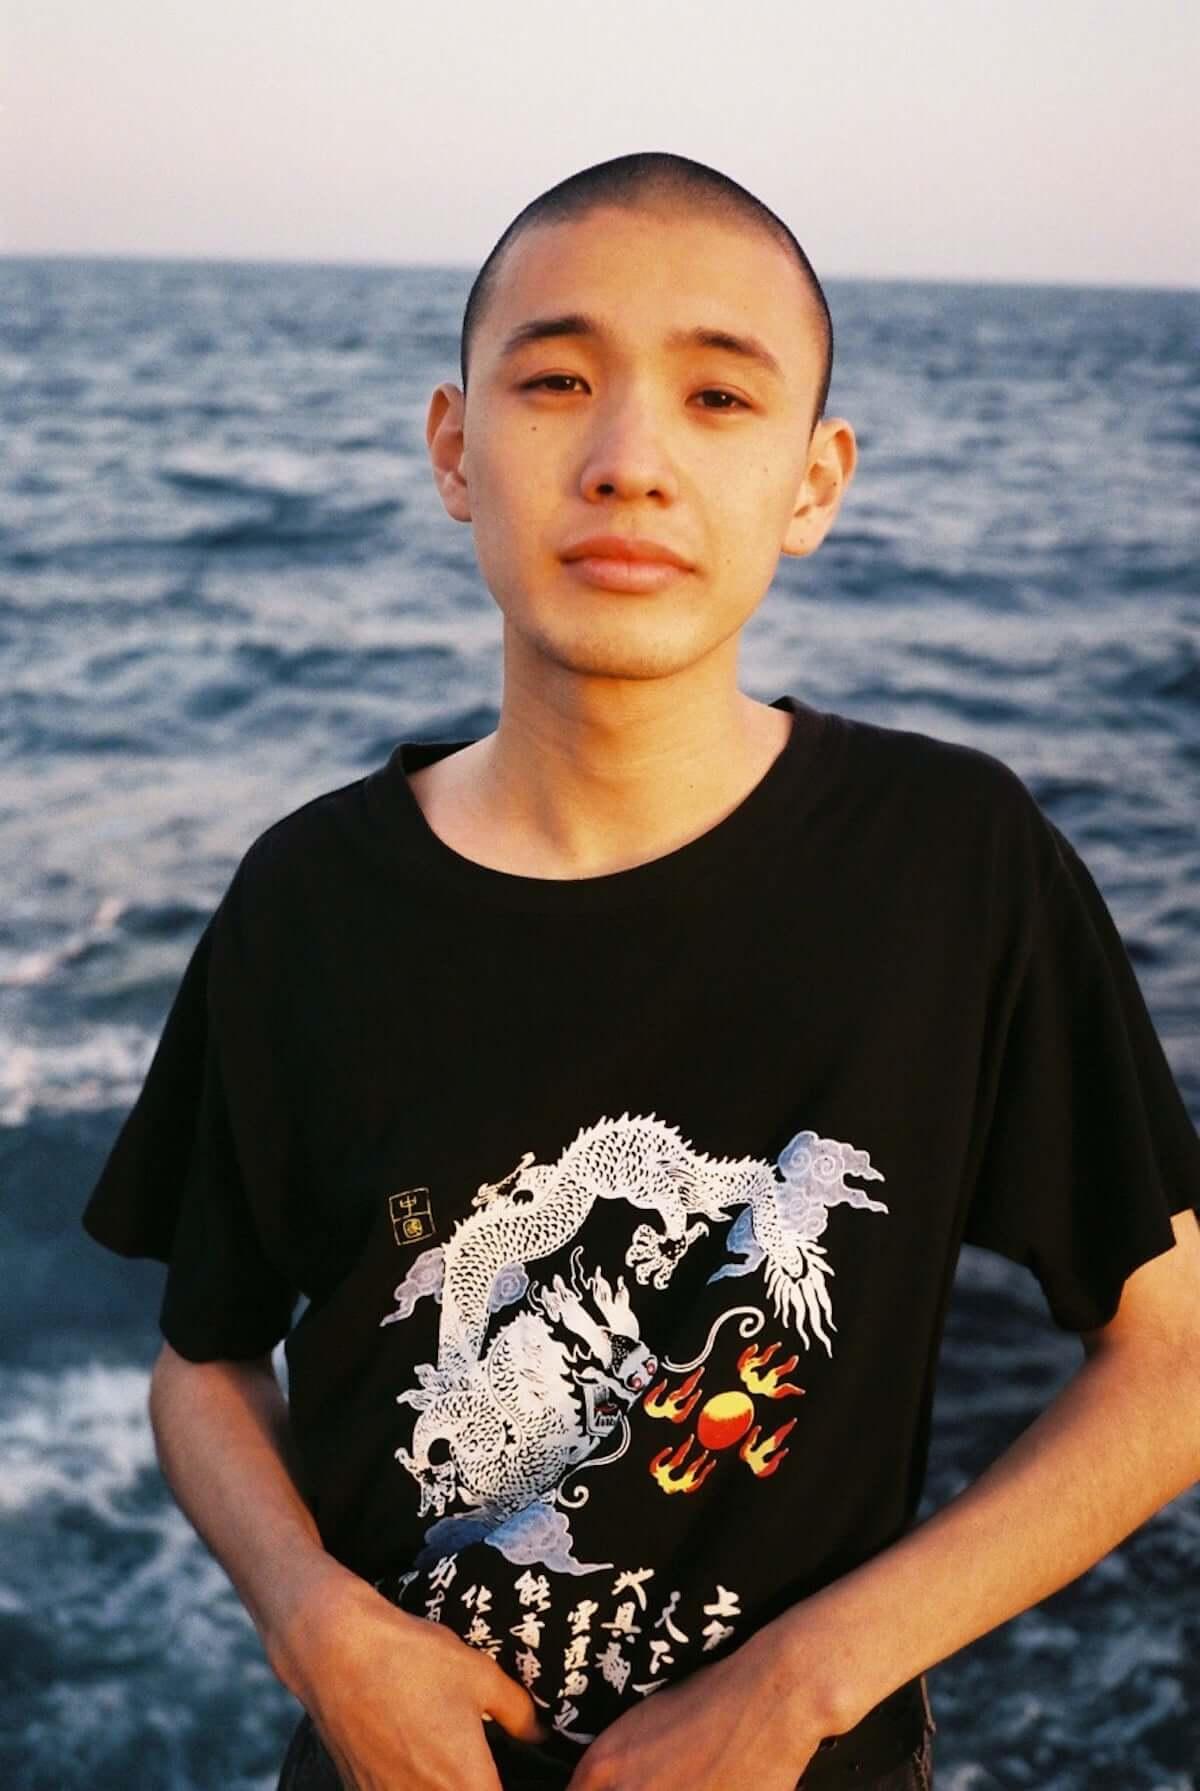 KID FRESINOによる3年振りとなる待望のフルアルバム「ài qíng」のジャケ写とトラックリストが公開 music181106-kidfresino-2-1200x1791